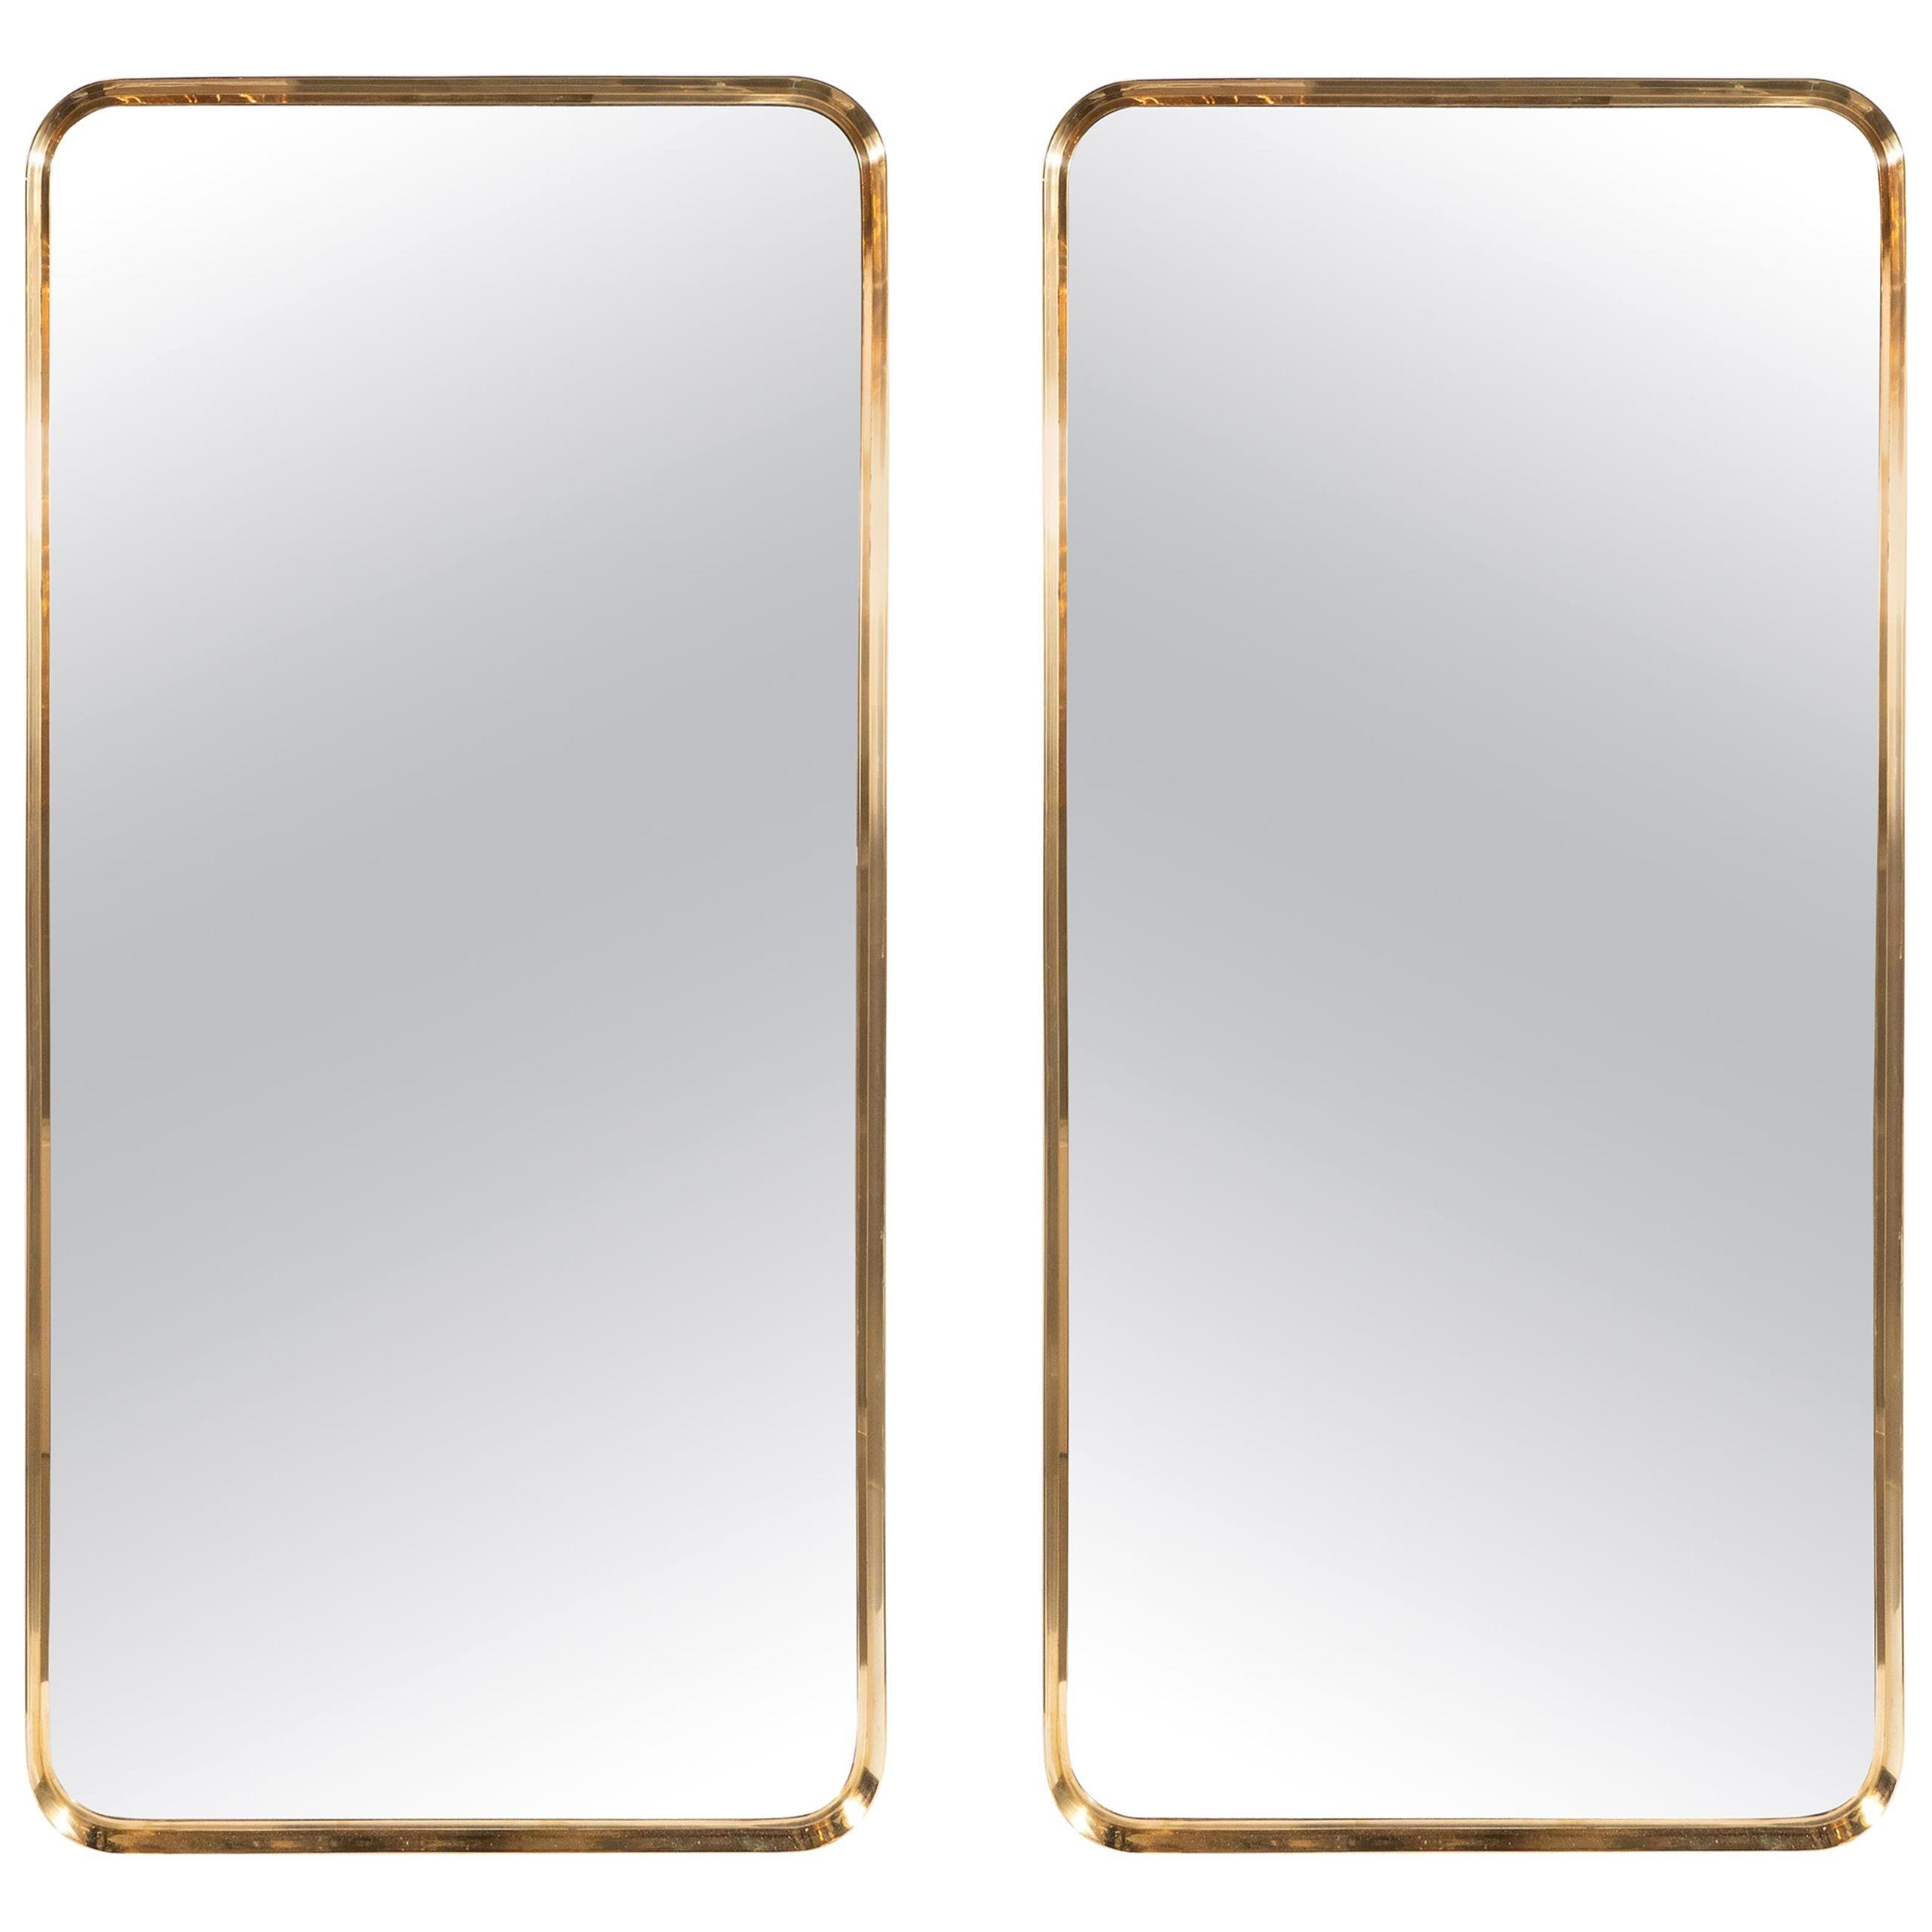 Pair of Italian Mid-Century Modern Rectangular Curvilinear Brass Wrapped Mirrors